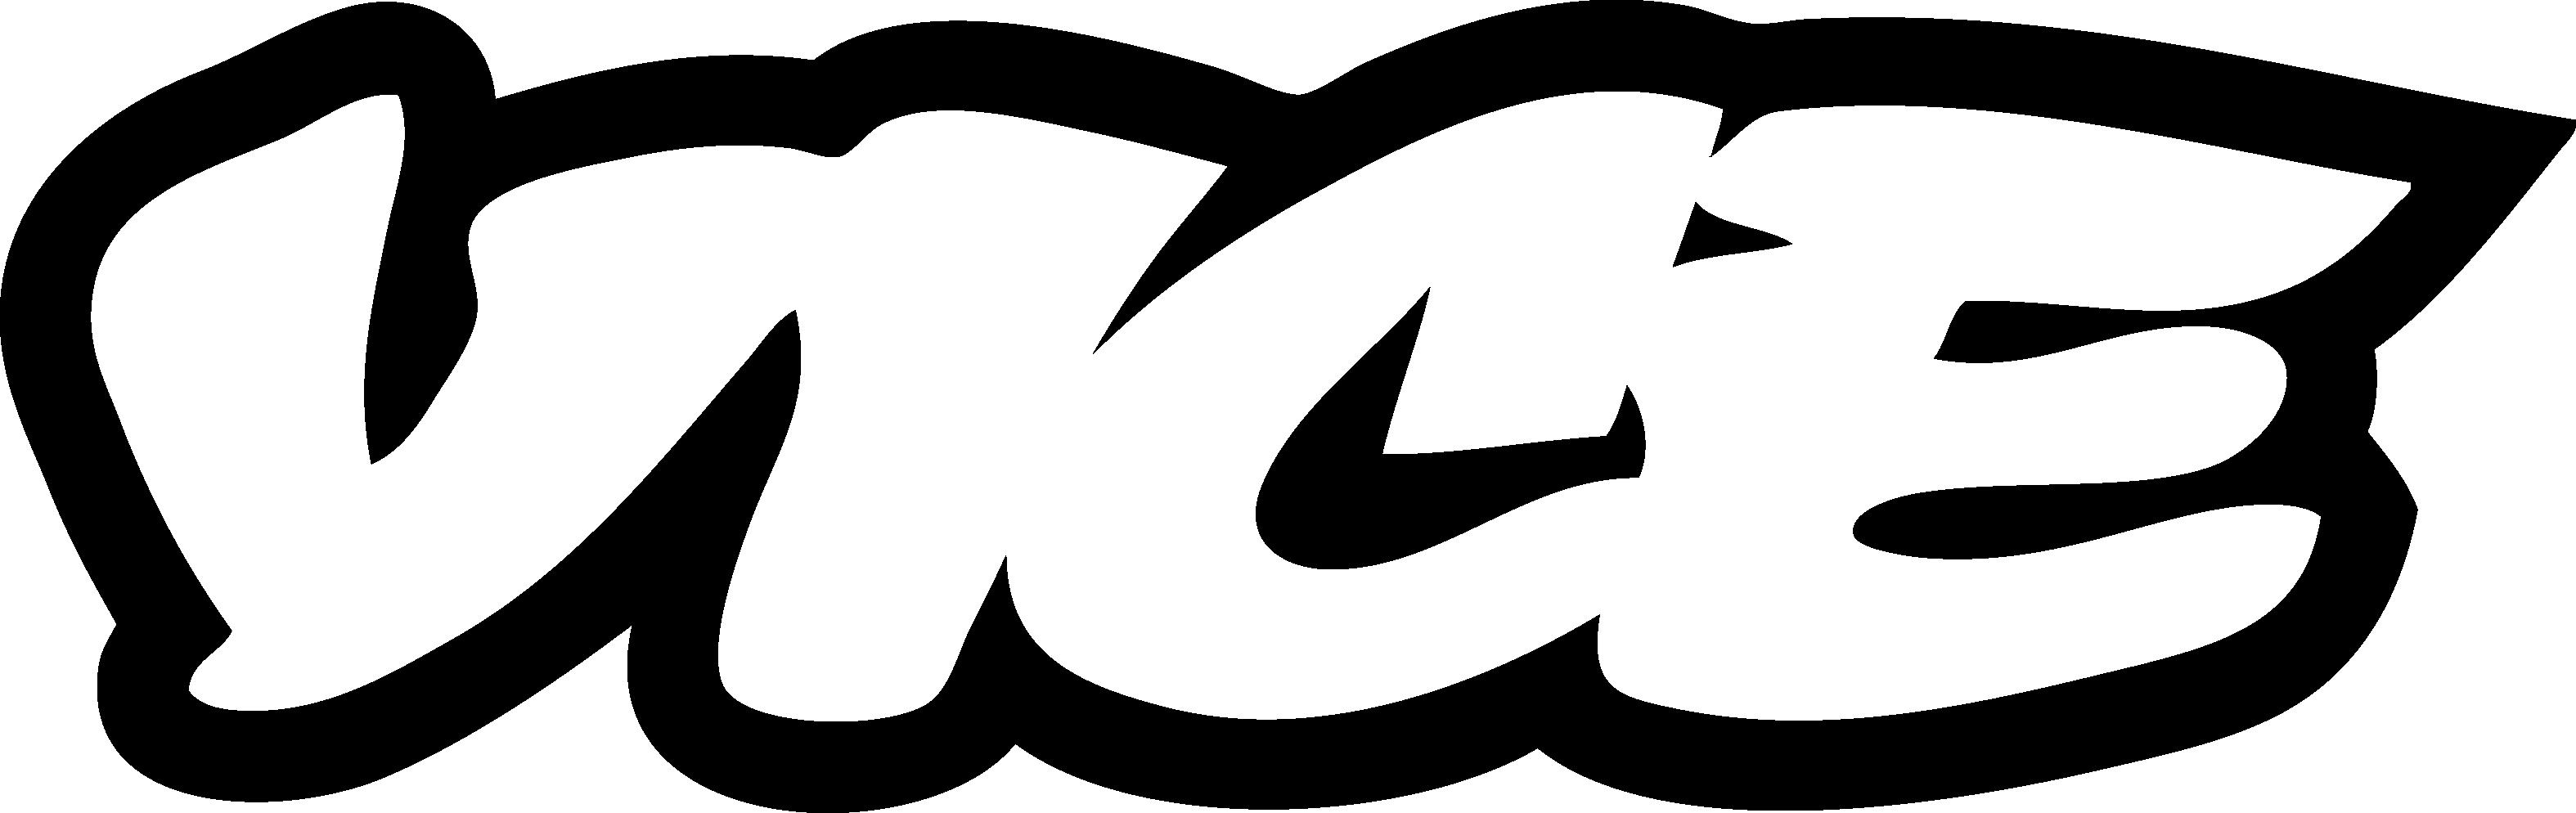 vice-logo